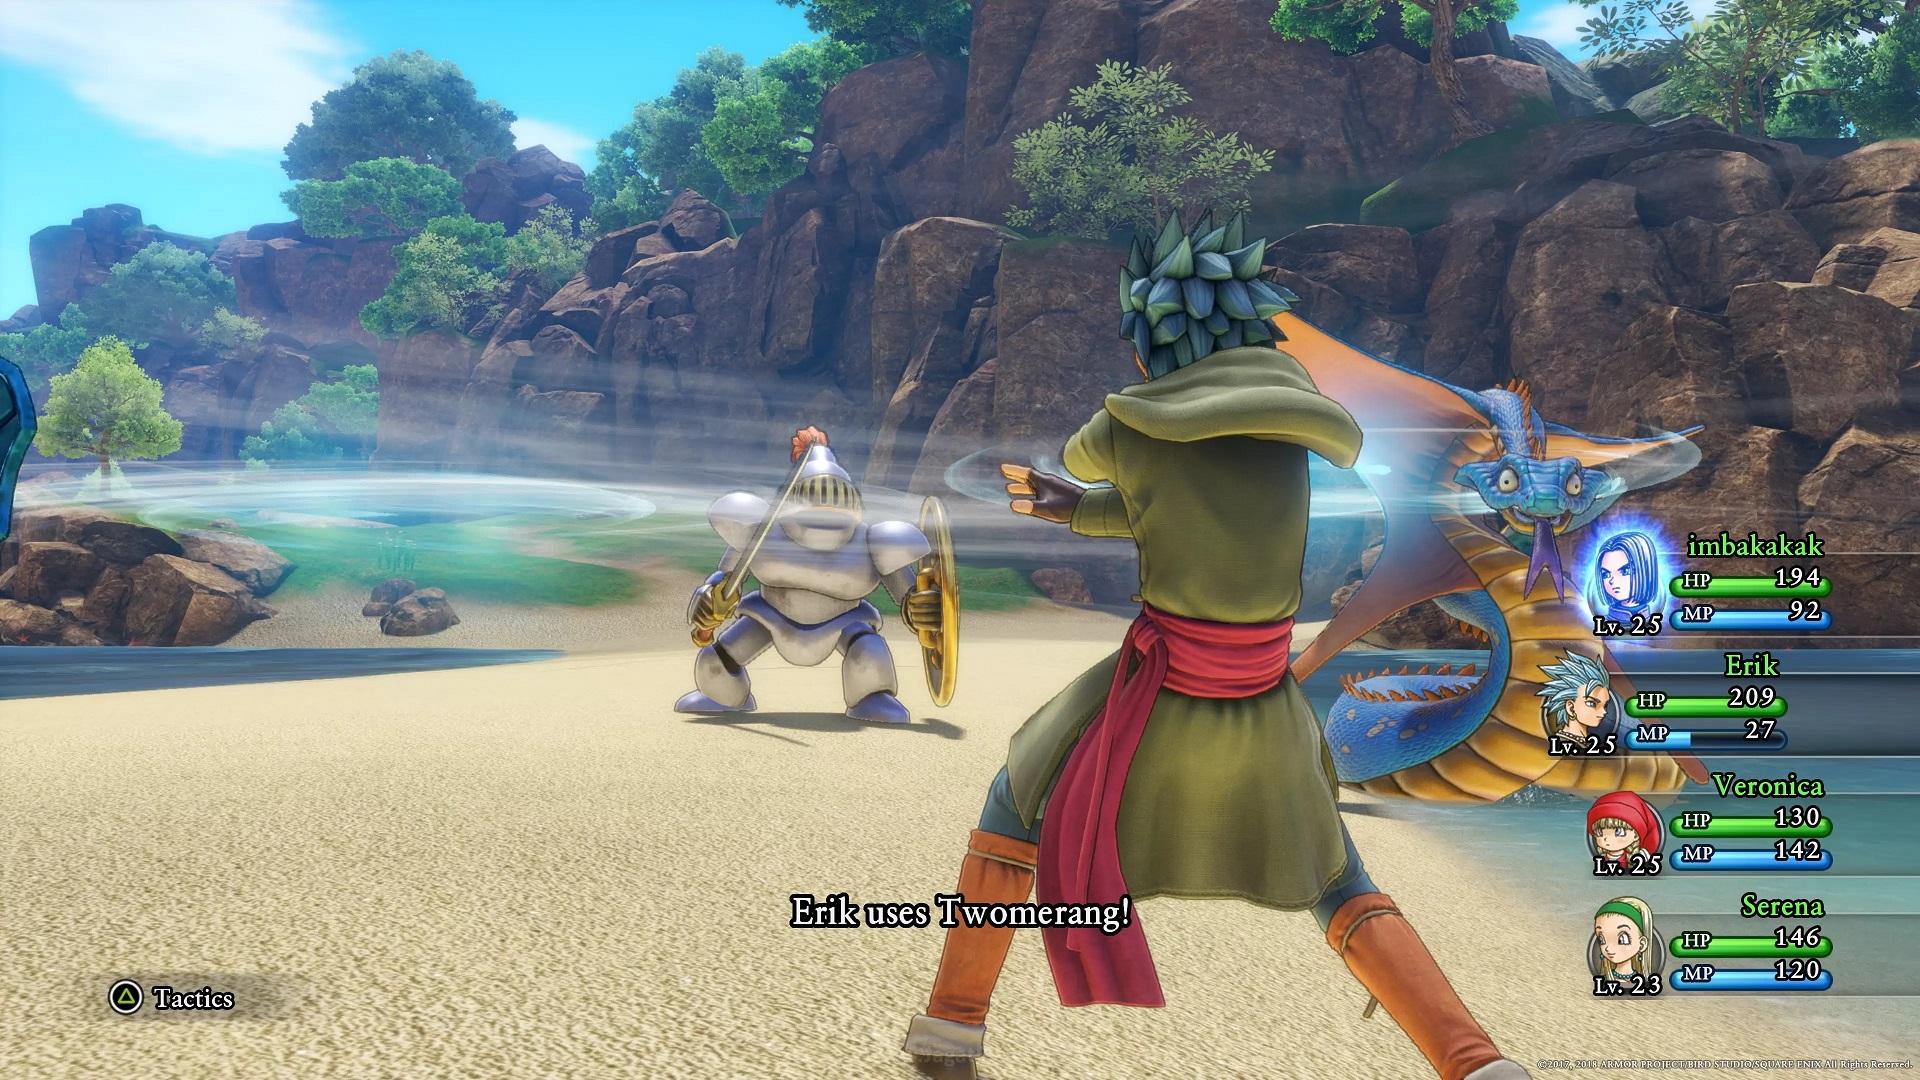 dragon-quest-xi-echoes-of-an-elusive-age-pc-screenshot-2